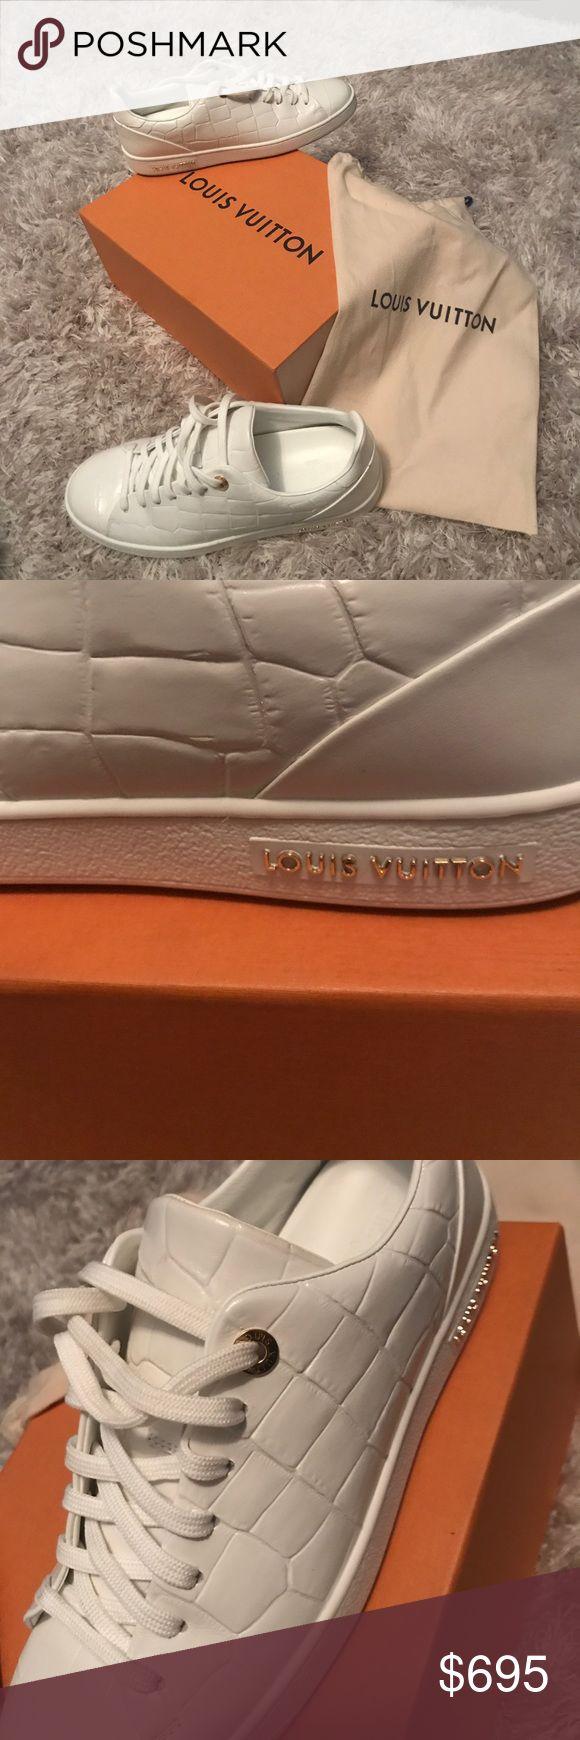 Louis Vuitton cocaine white sneakers. Authentic made in Italy sneakers Louis Vuitton Shoes Sneakers